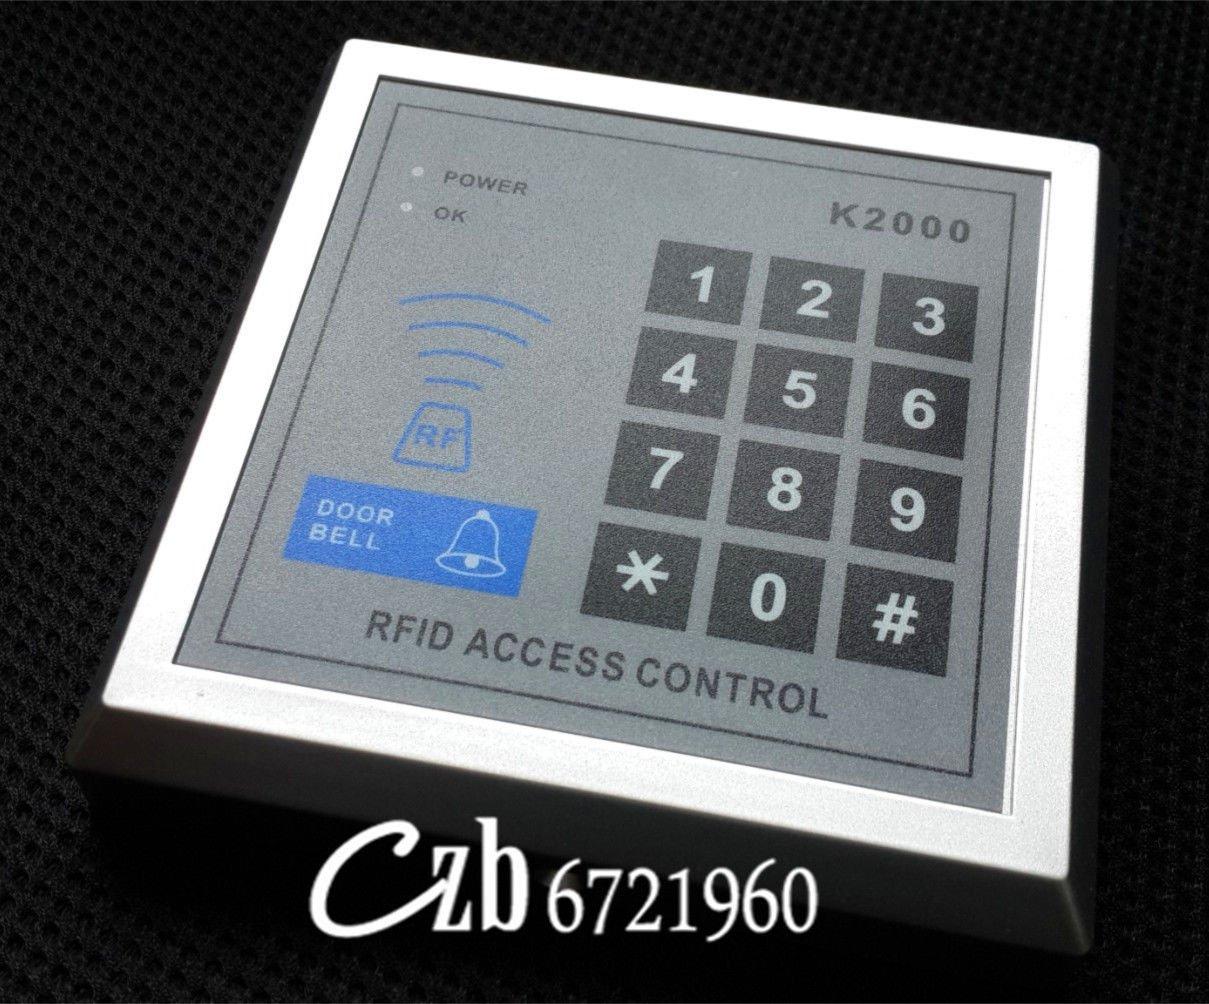 RFID Security Door Lock Access Control System